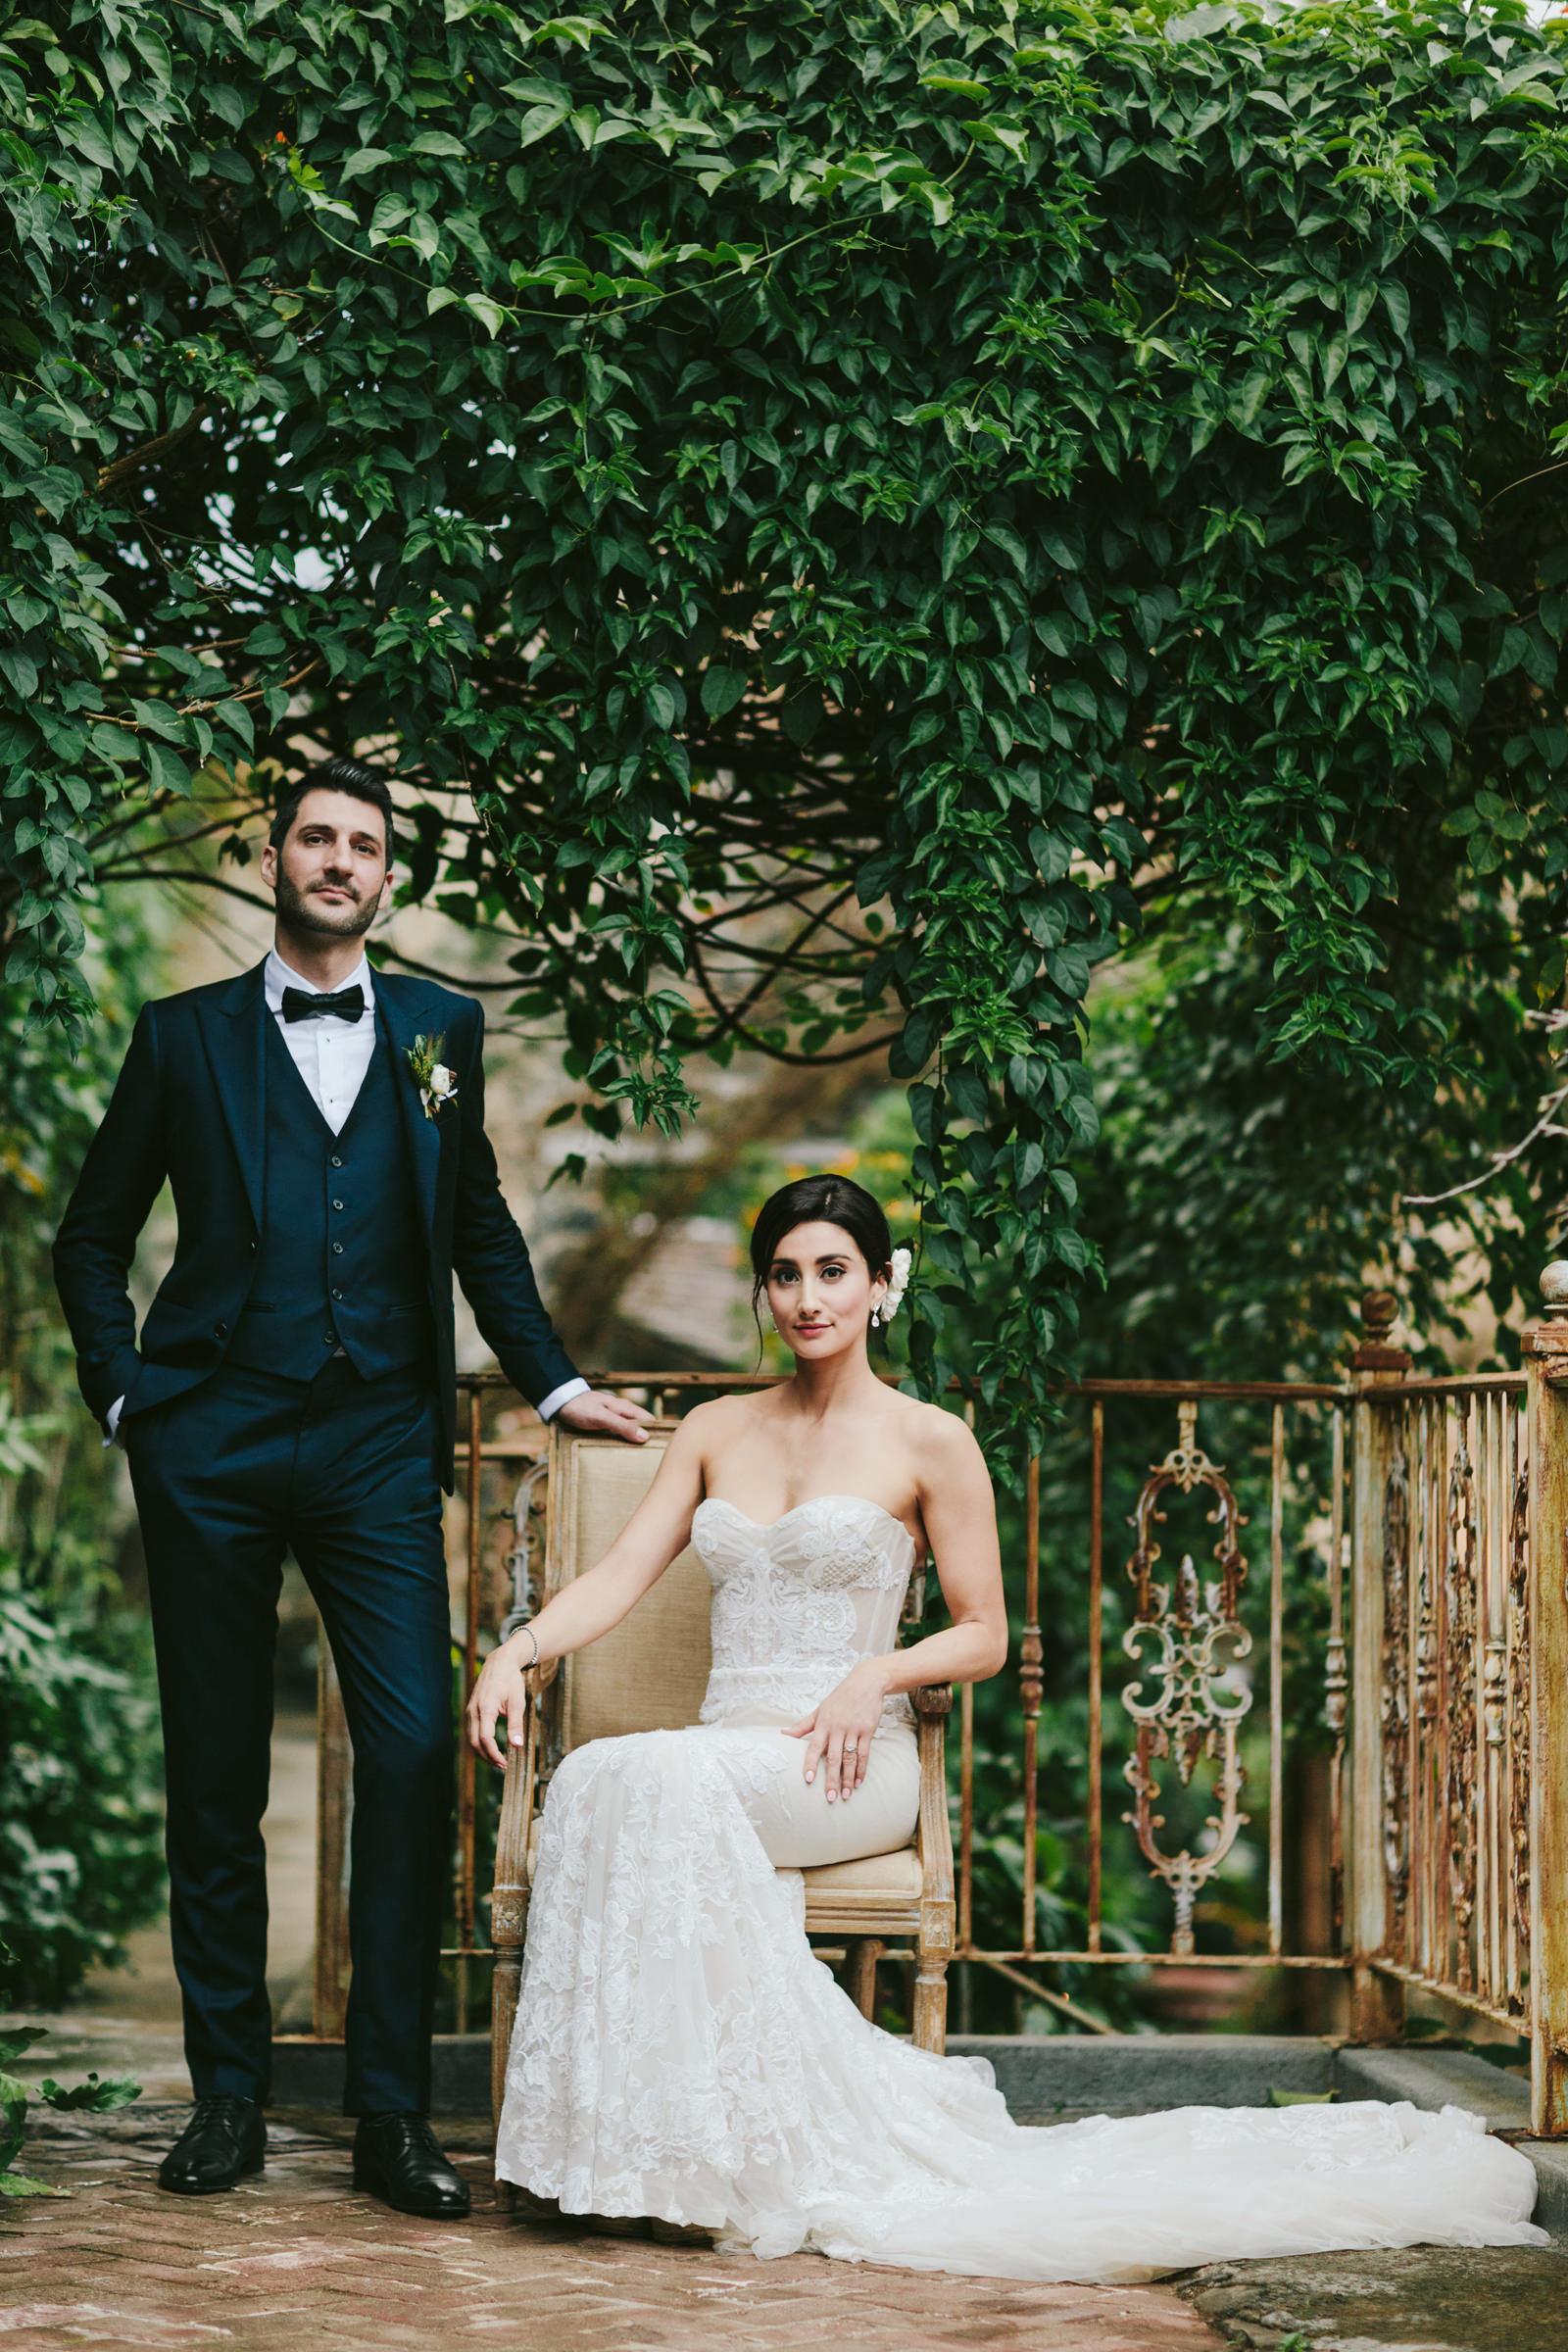 Haiku Mill Maui couple portrait with groom standing - photo by Melia Lucida